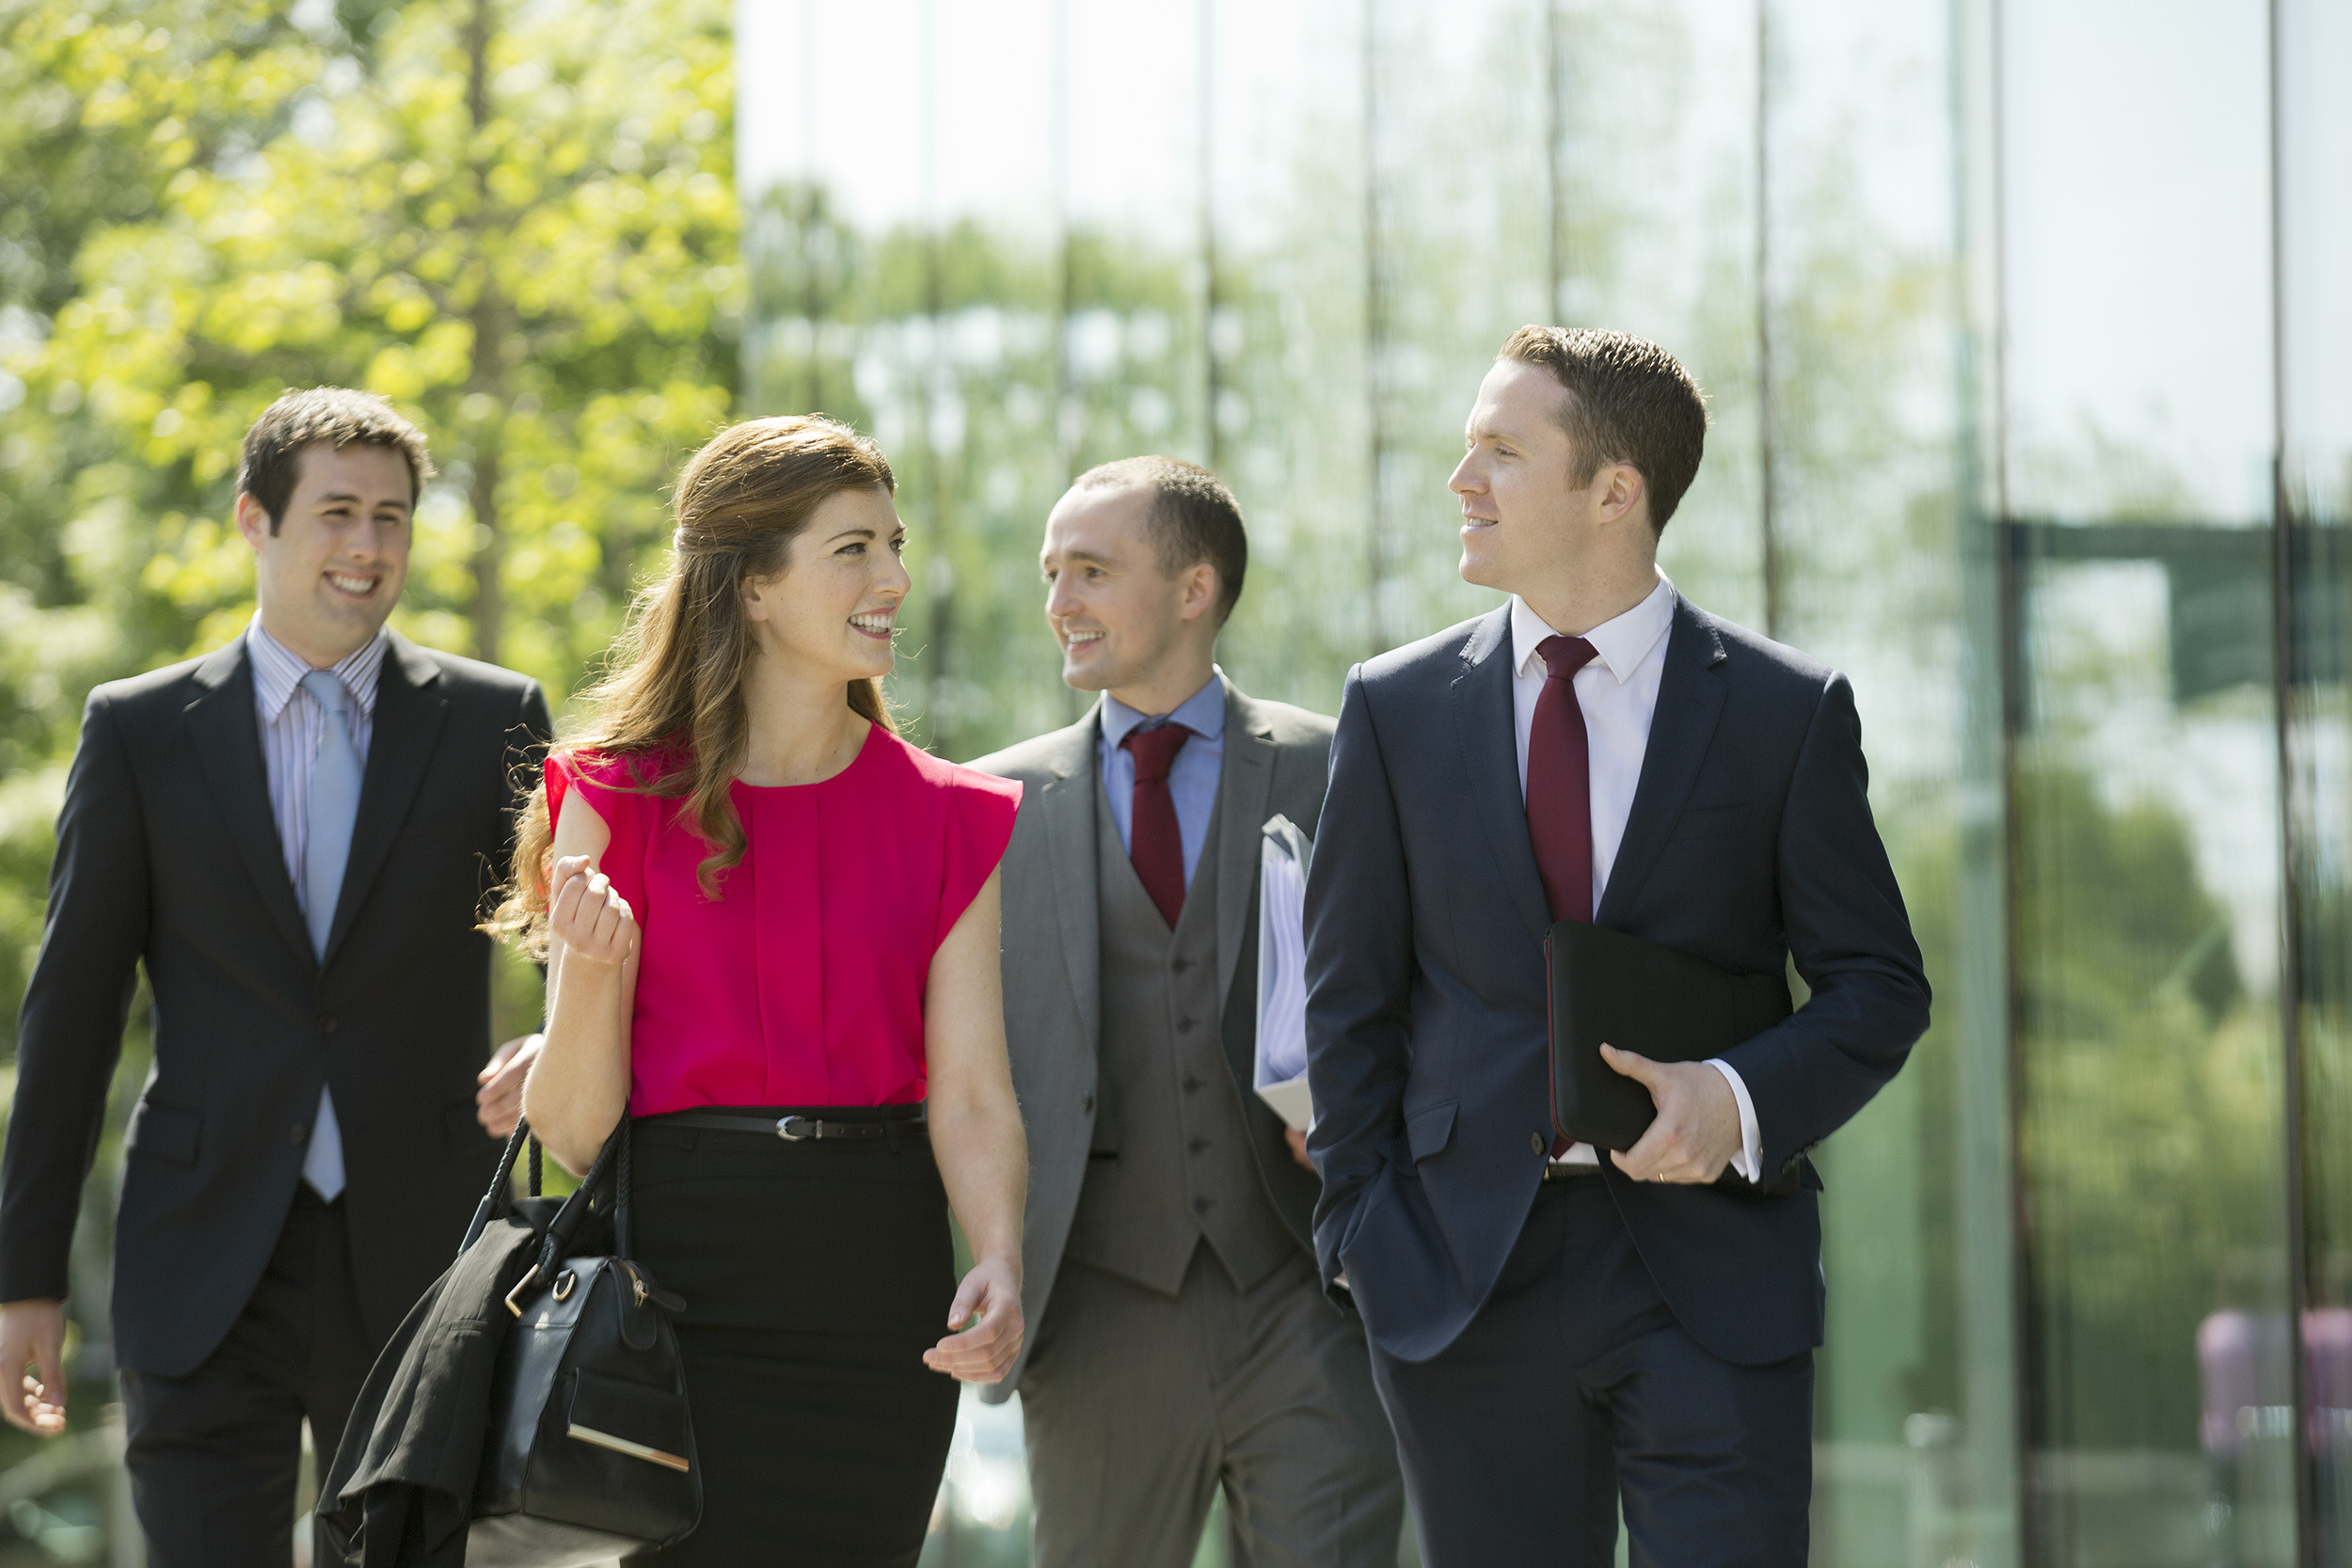 KPMG Graduate Recruitment